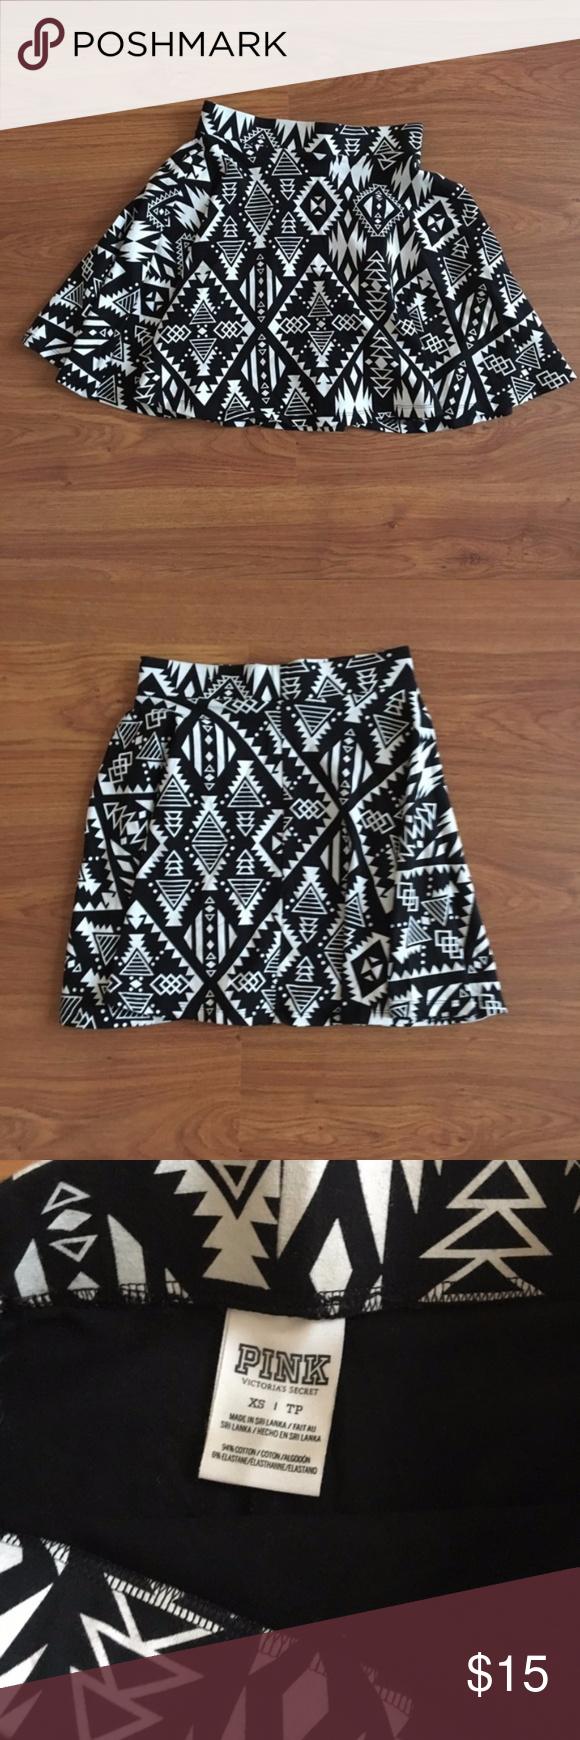 Victorias Secret PINK Black High Waisted Stretch Mini Skirt XS